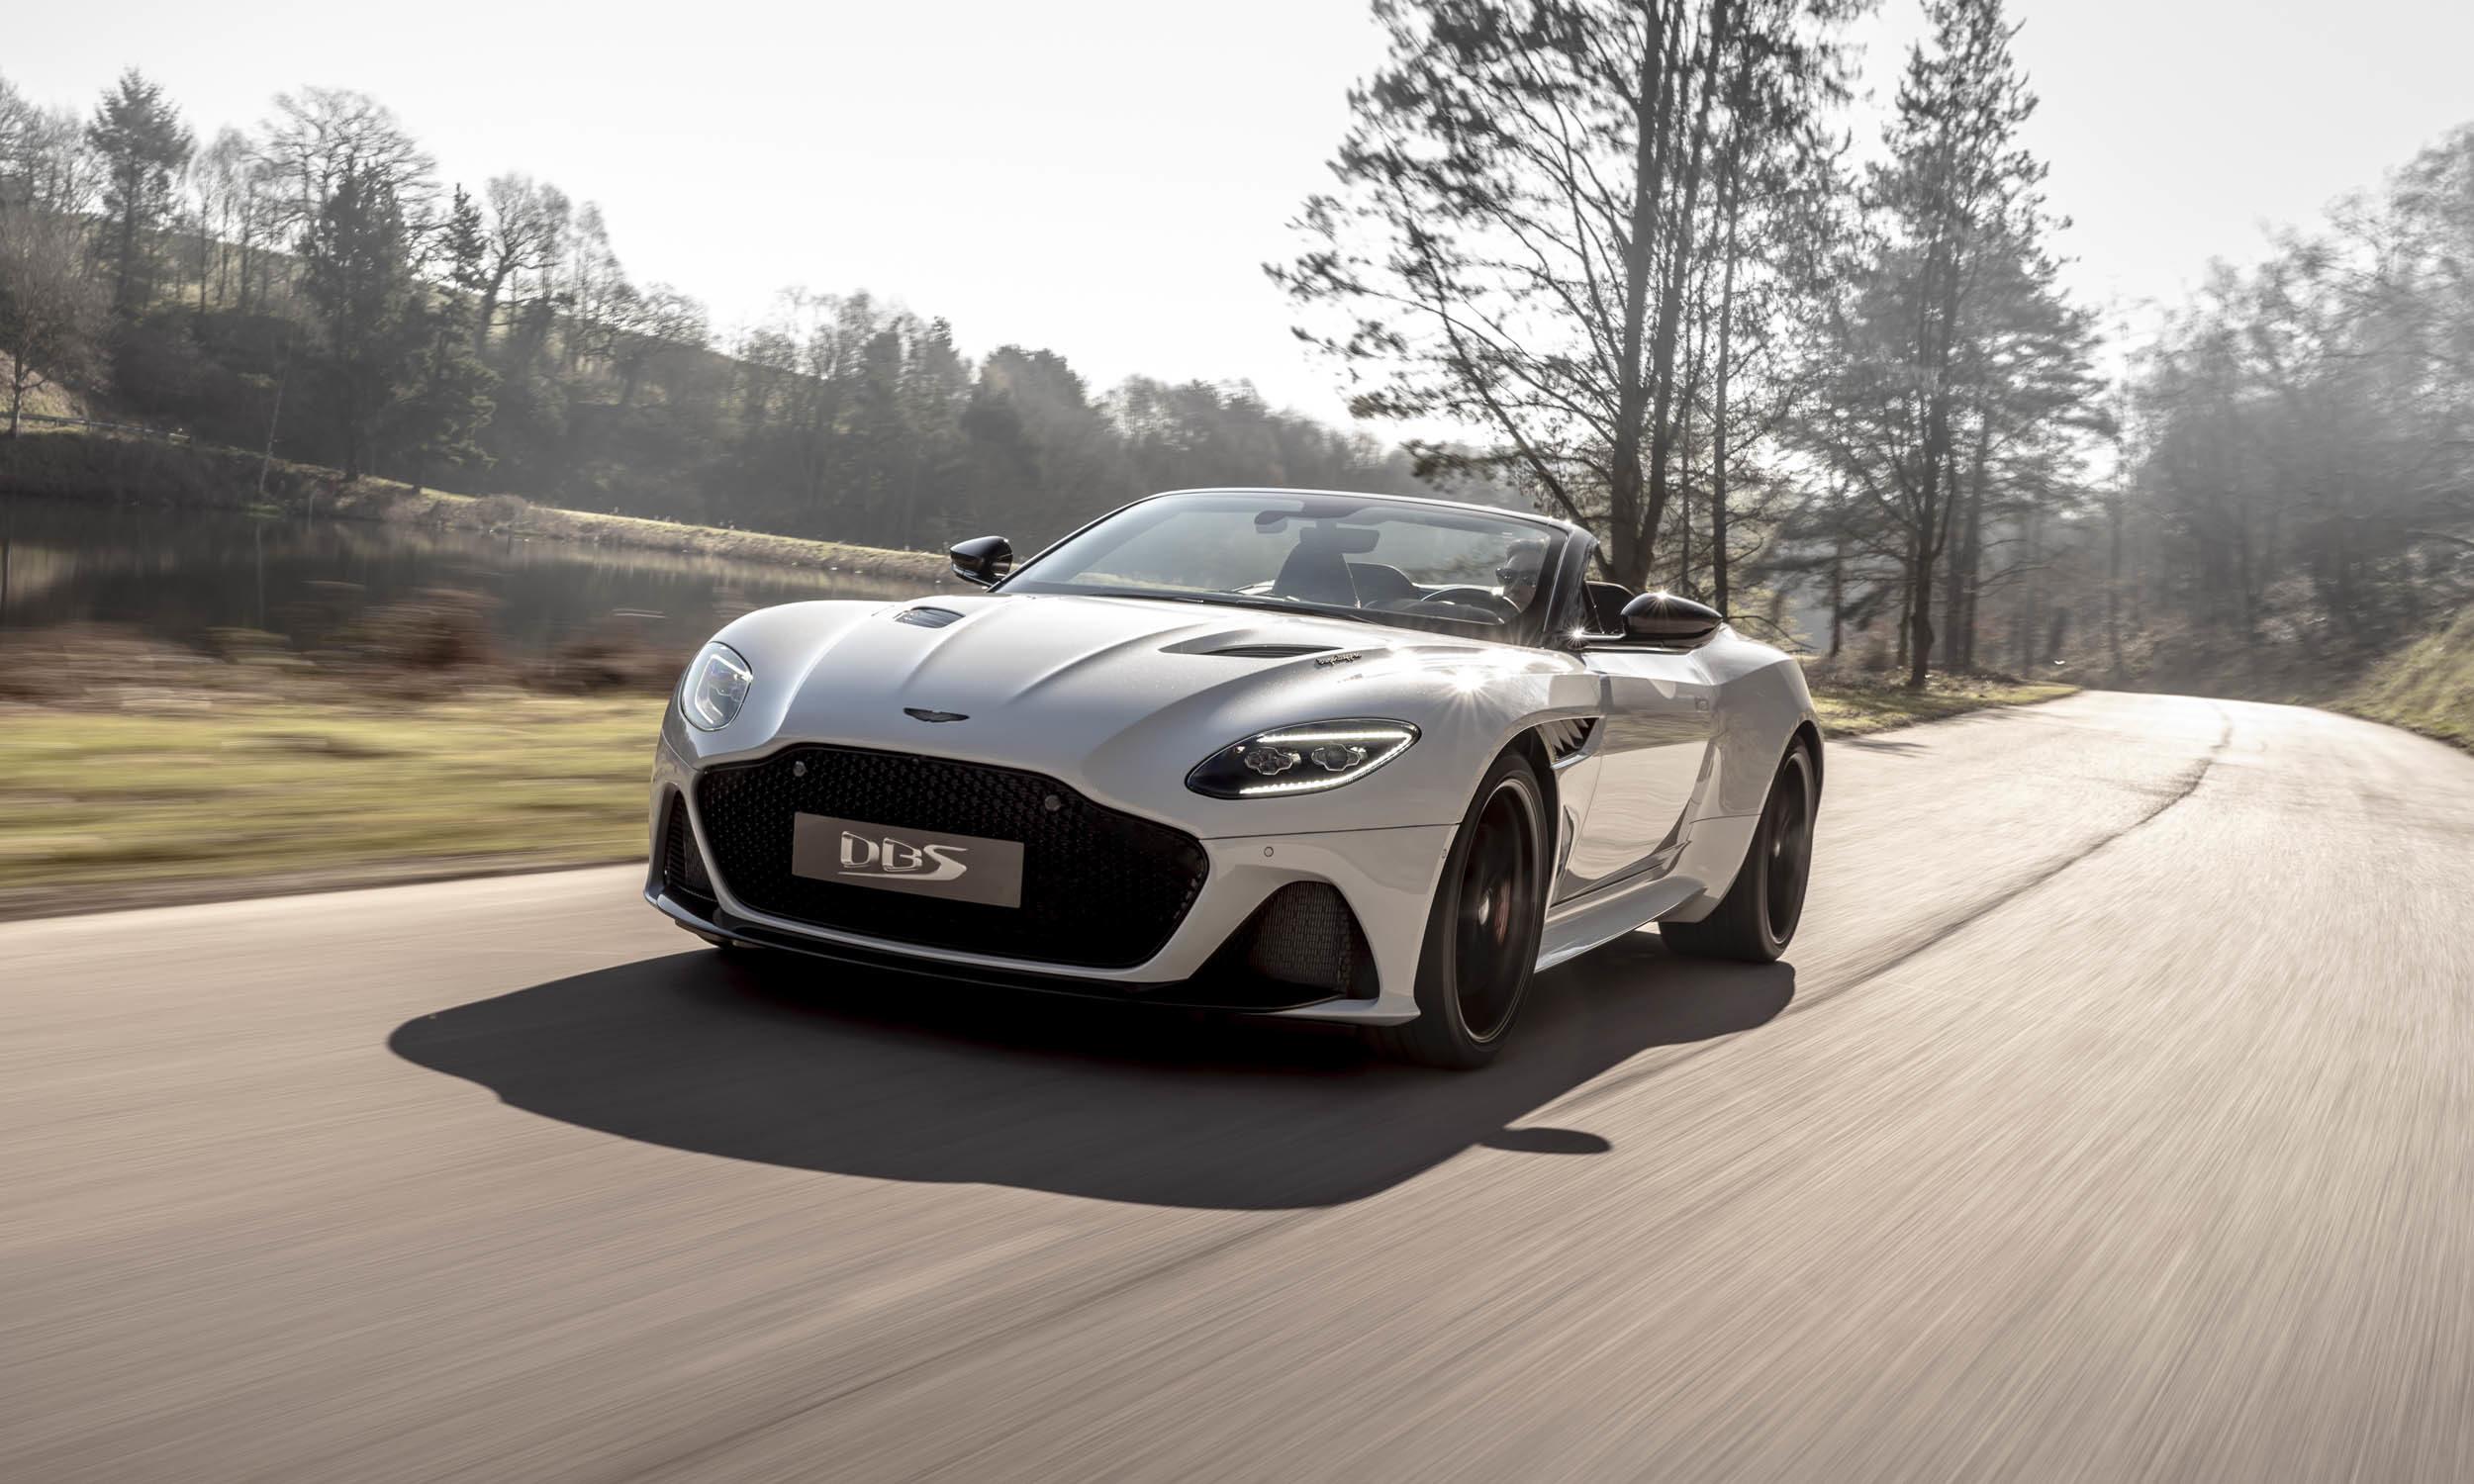 Aston-Martin-DBS-Superleggera-Volante1.jpg